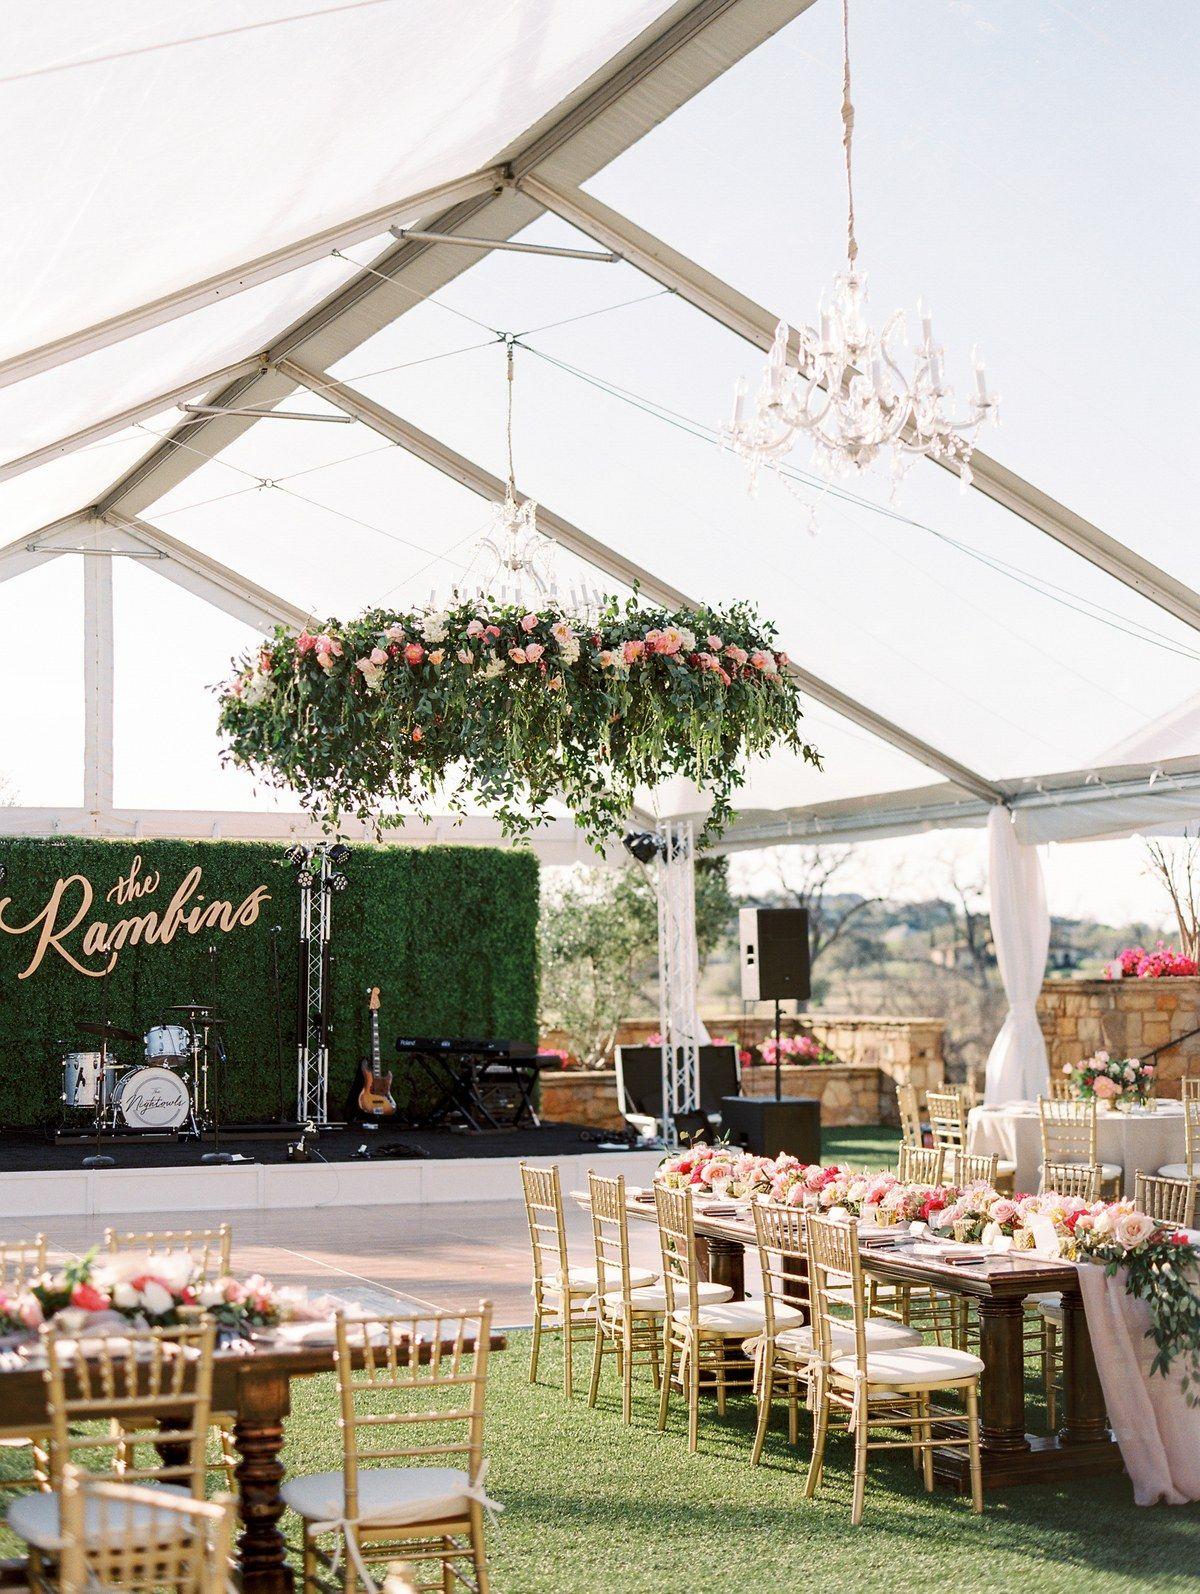 24 Flower Chandeliers To Give Your Wedding A Garden Fresh Feel Tent Wedding Reception Garden Wedding Reception Outdoor Wedding Decorations